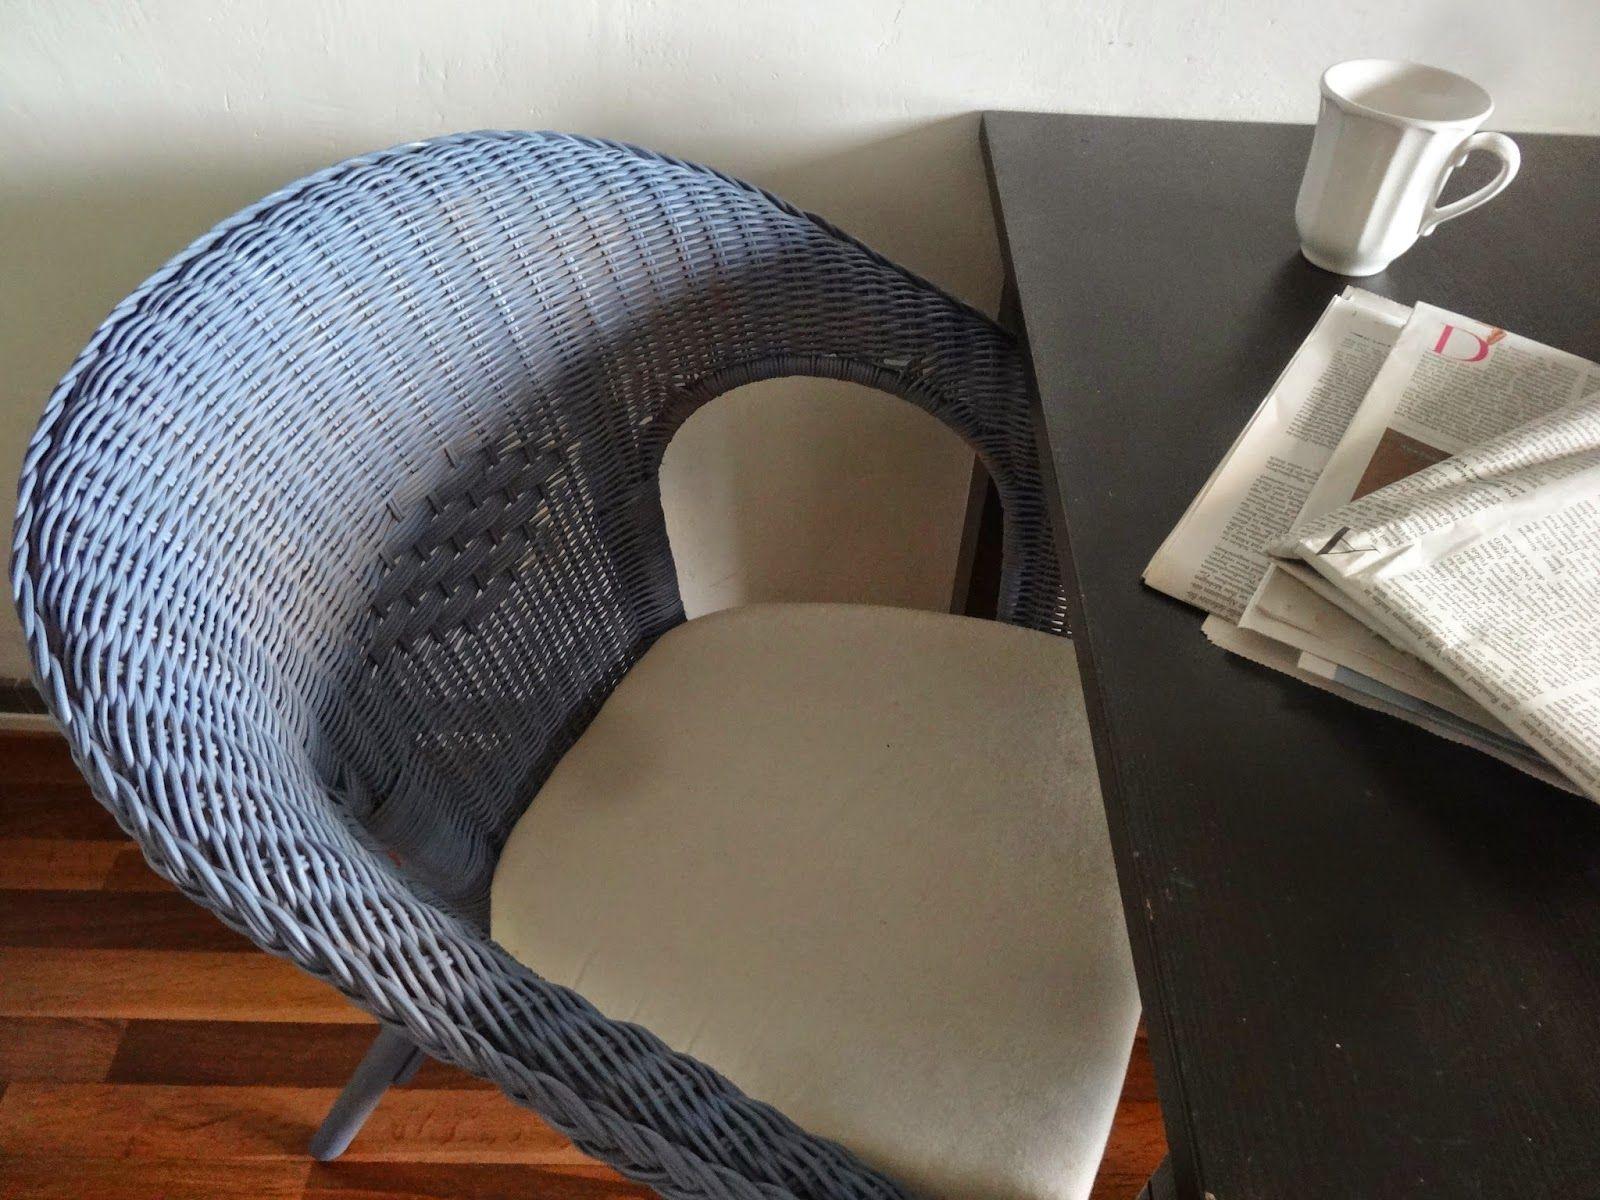 Coprisedie Thonet ~ 25 best ideas about ikea stühle on pinterest ikea stuhl grauer